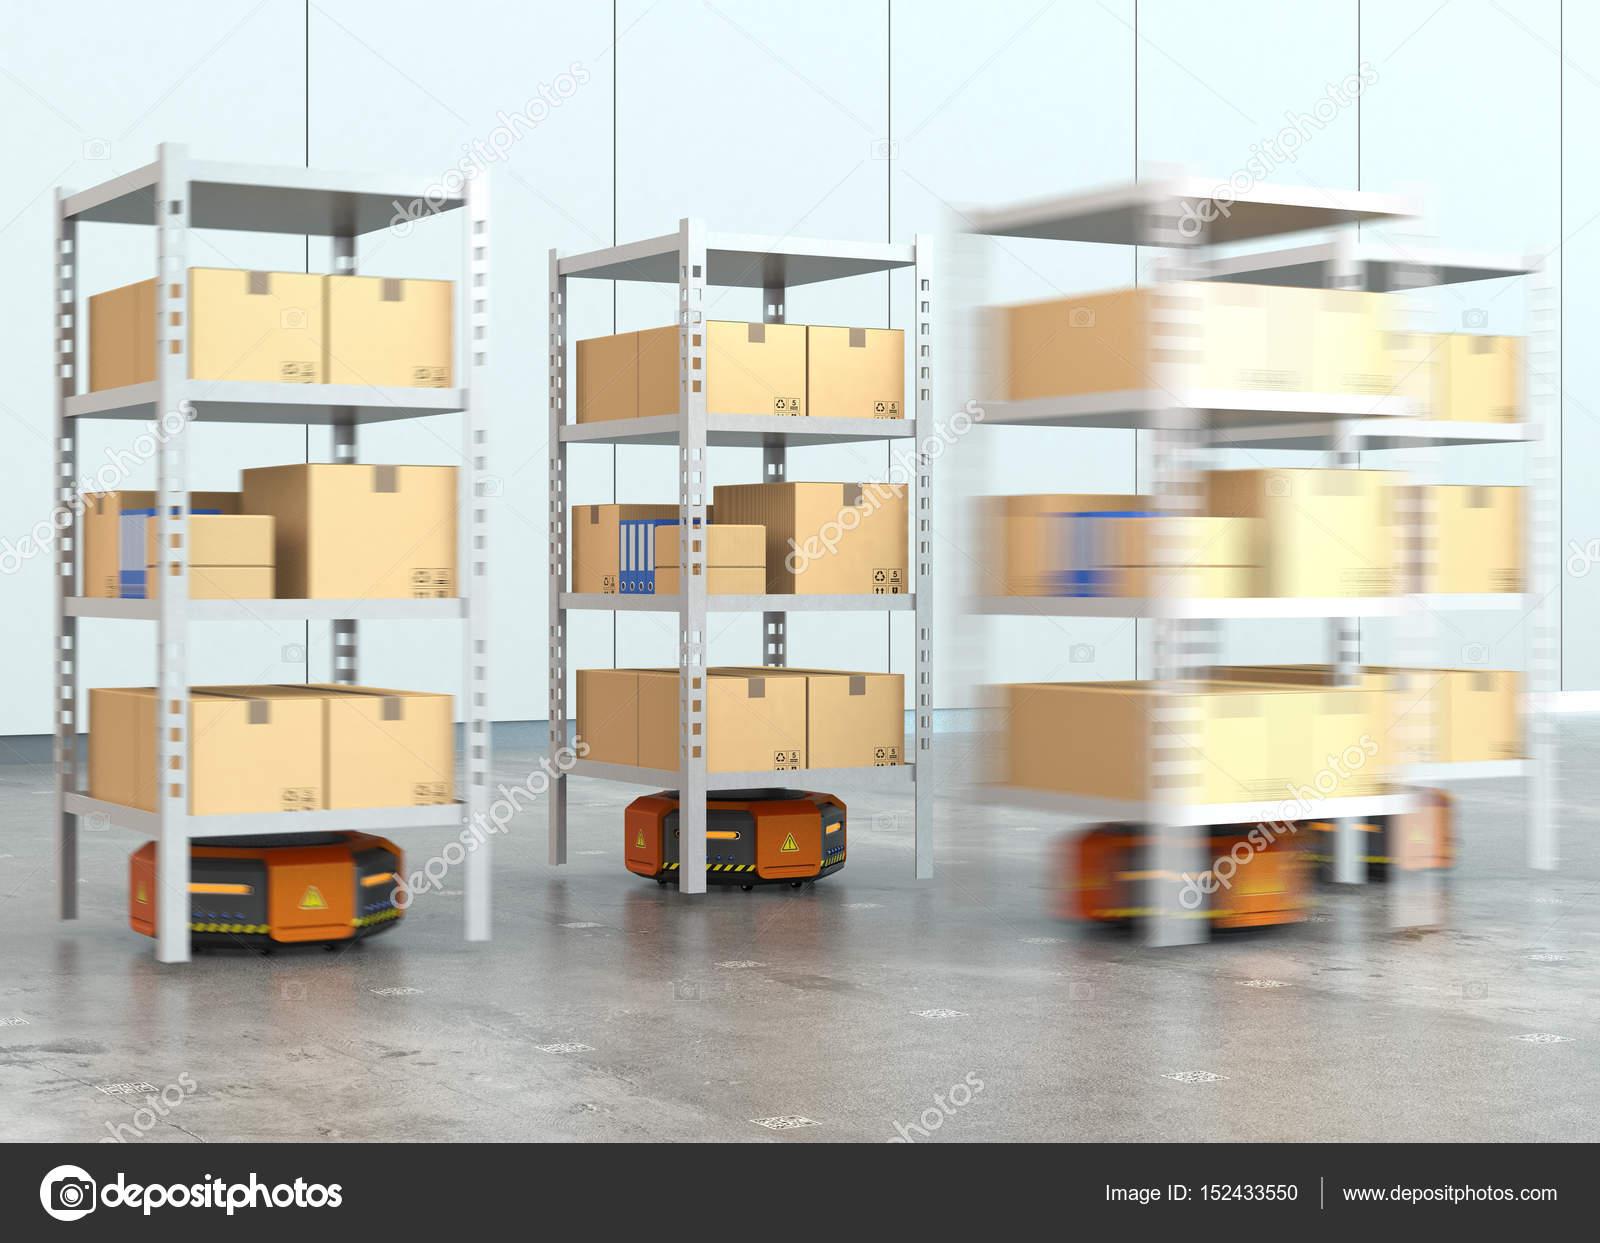 Mit paletten interesting mobel bauen aus paletten balkonmobel selber bauen kche aus paletten - Paletten balkonmobel ...